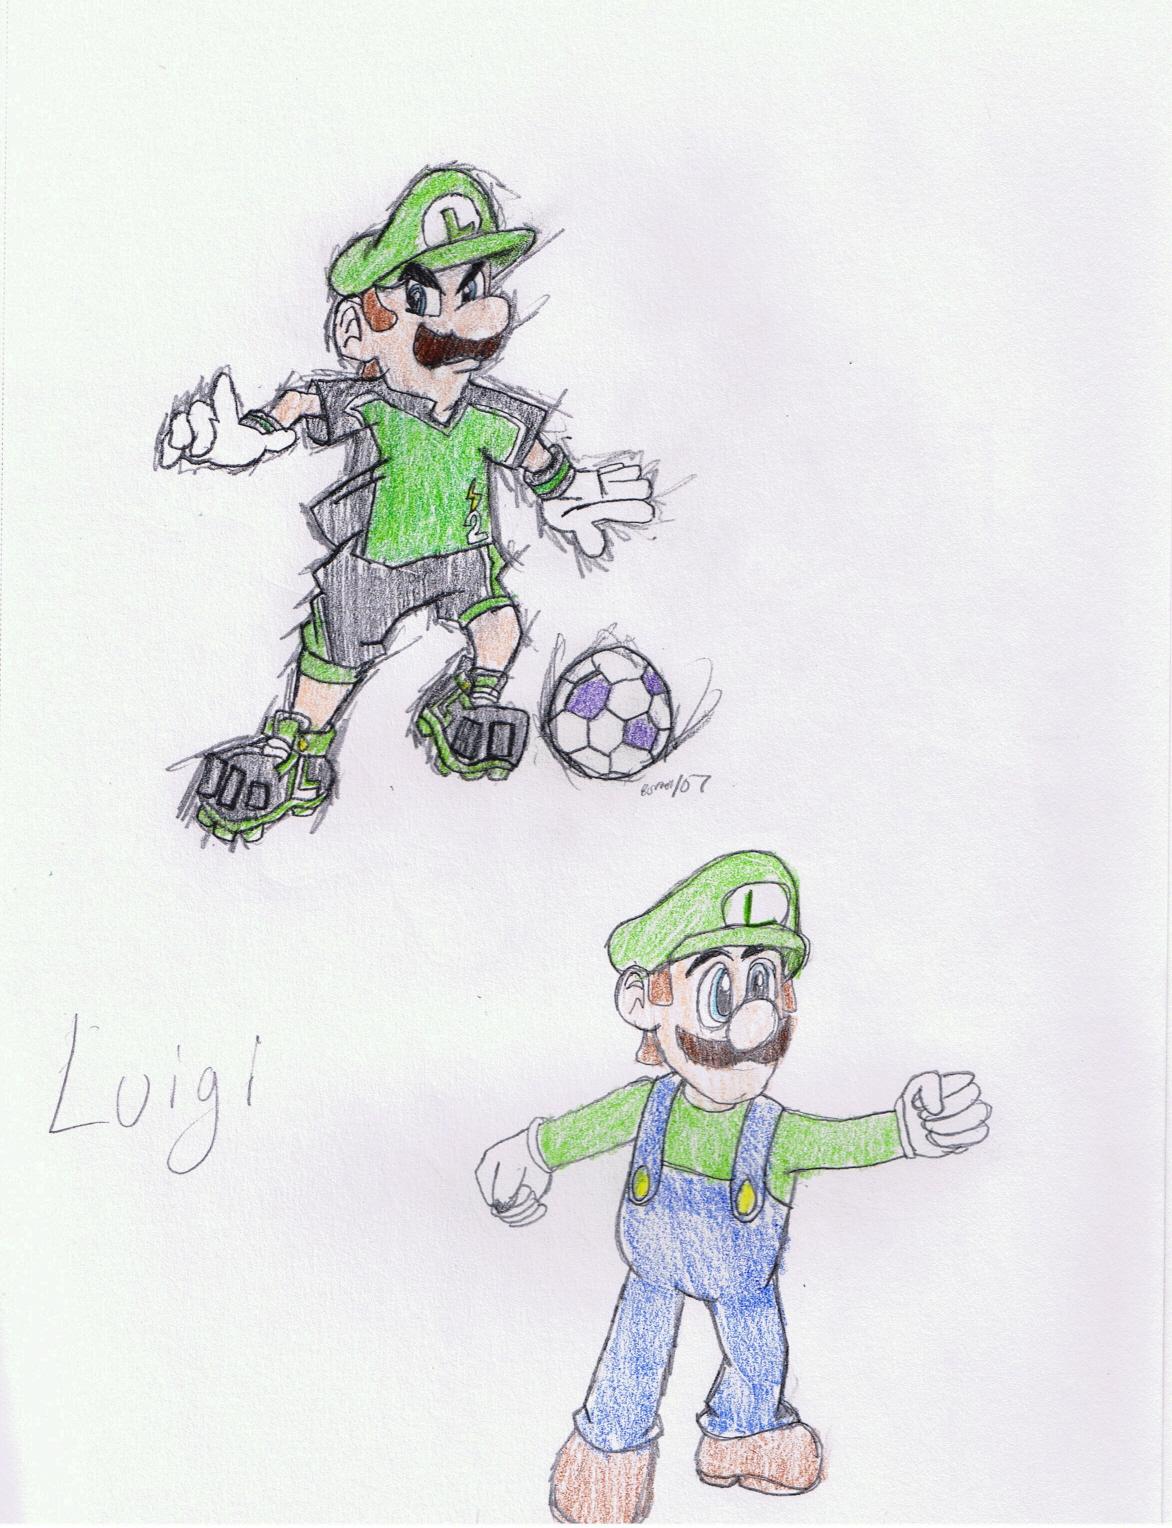 Luigi by iloveanime